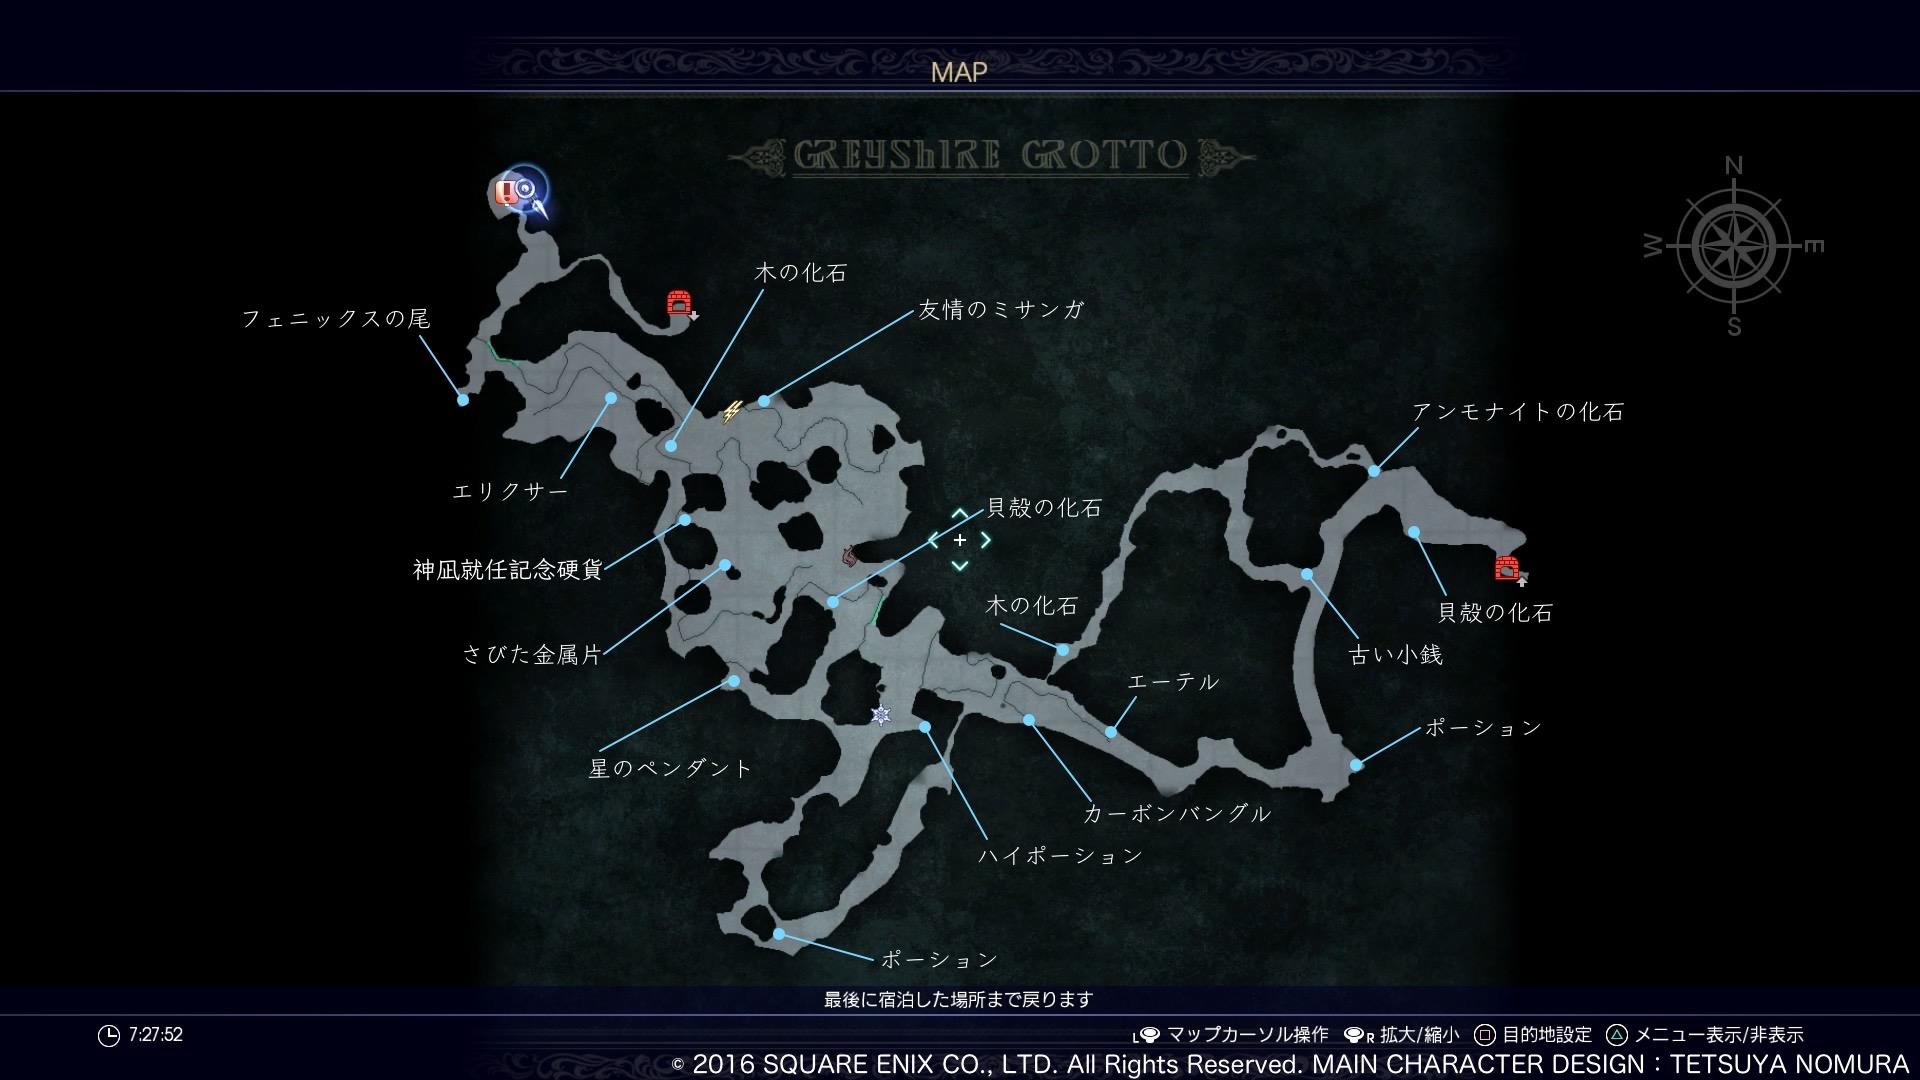 MAP・グレイシャー洞窟